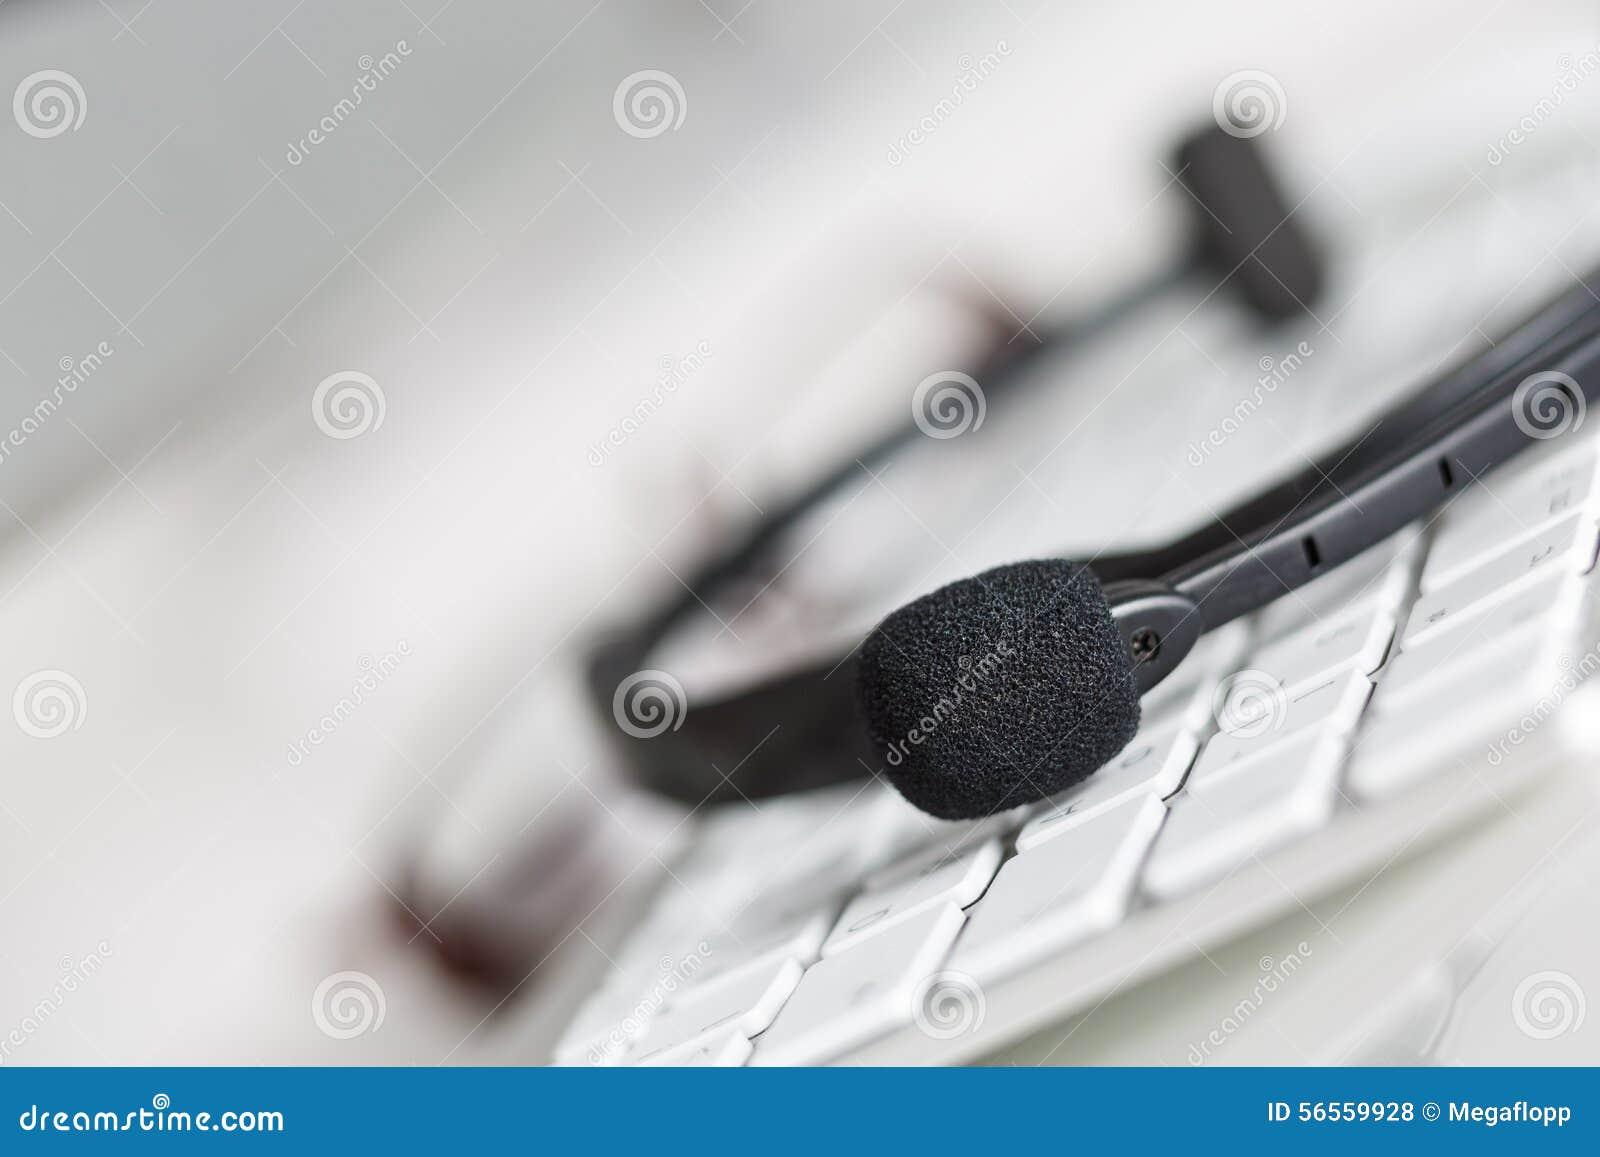 Download Κενή θέση εργασίας του χειριστή υπηρεσιών τηλεφωνικών κέντρων Στοκ Εικόνες - εικόνα από αποδοτικός, συνεδρίαση: 56559928